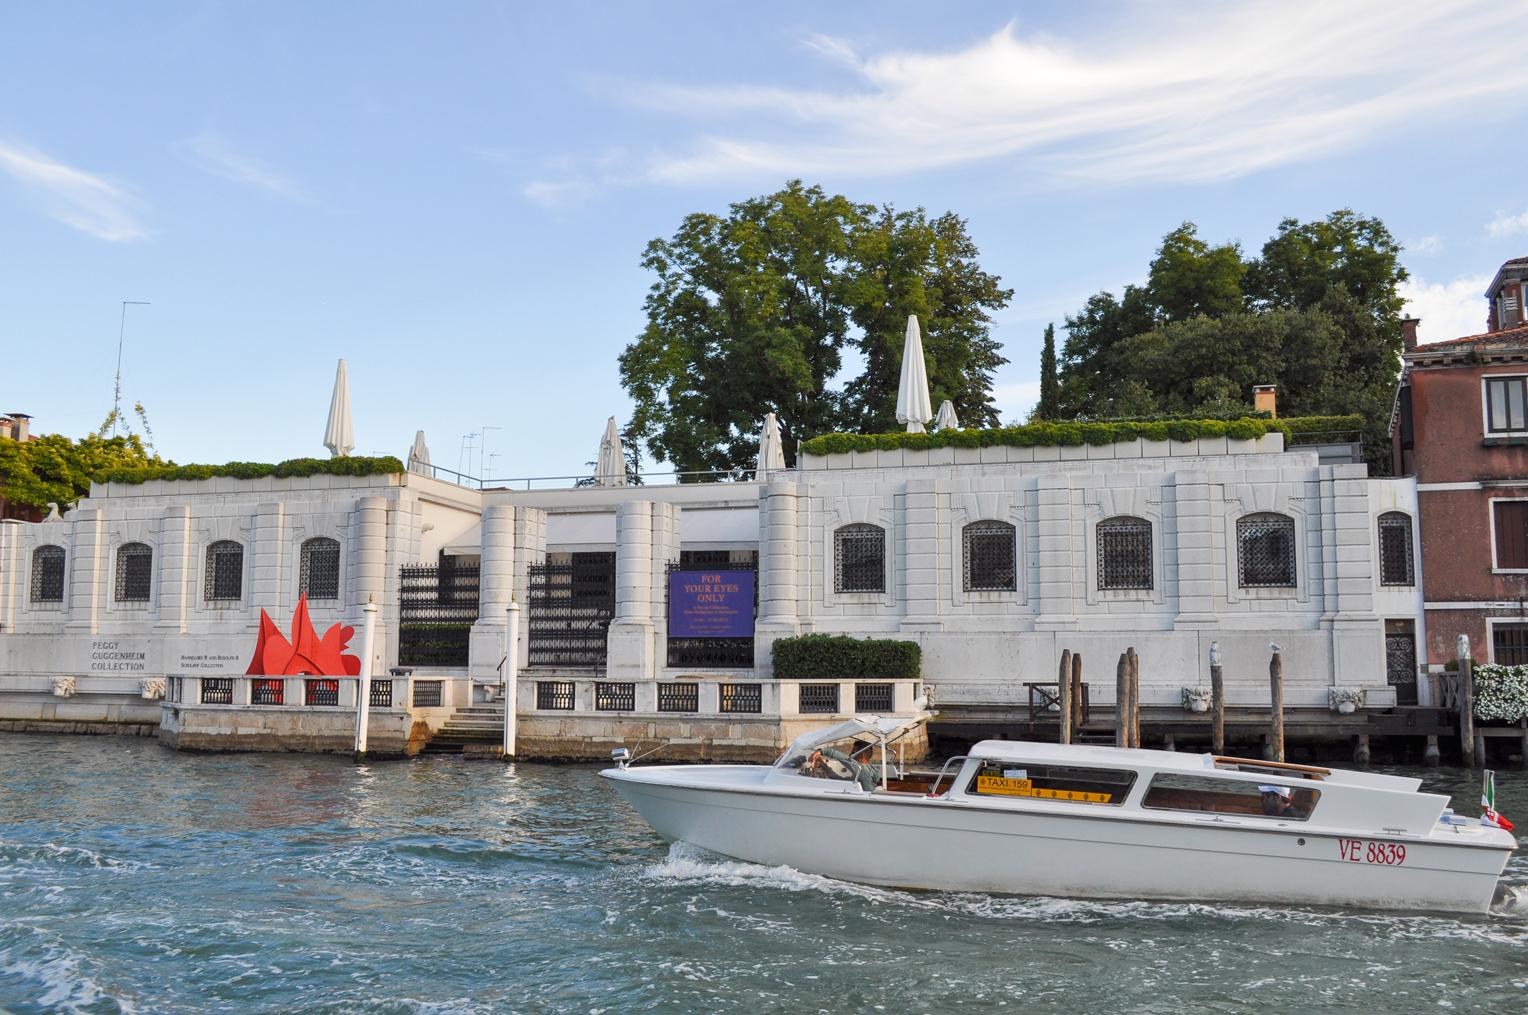 museo peggy guggenheim a venezia opere orari e biglietti